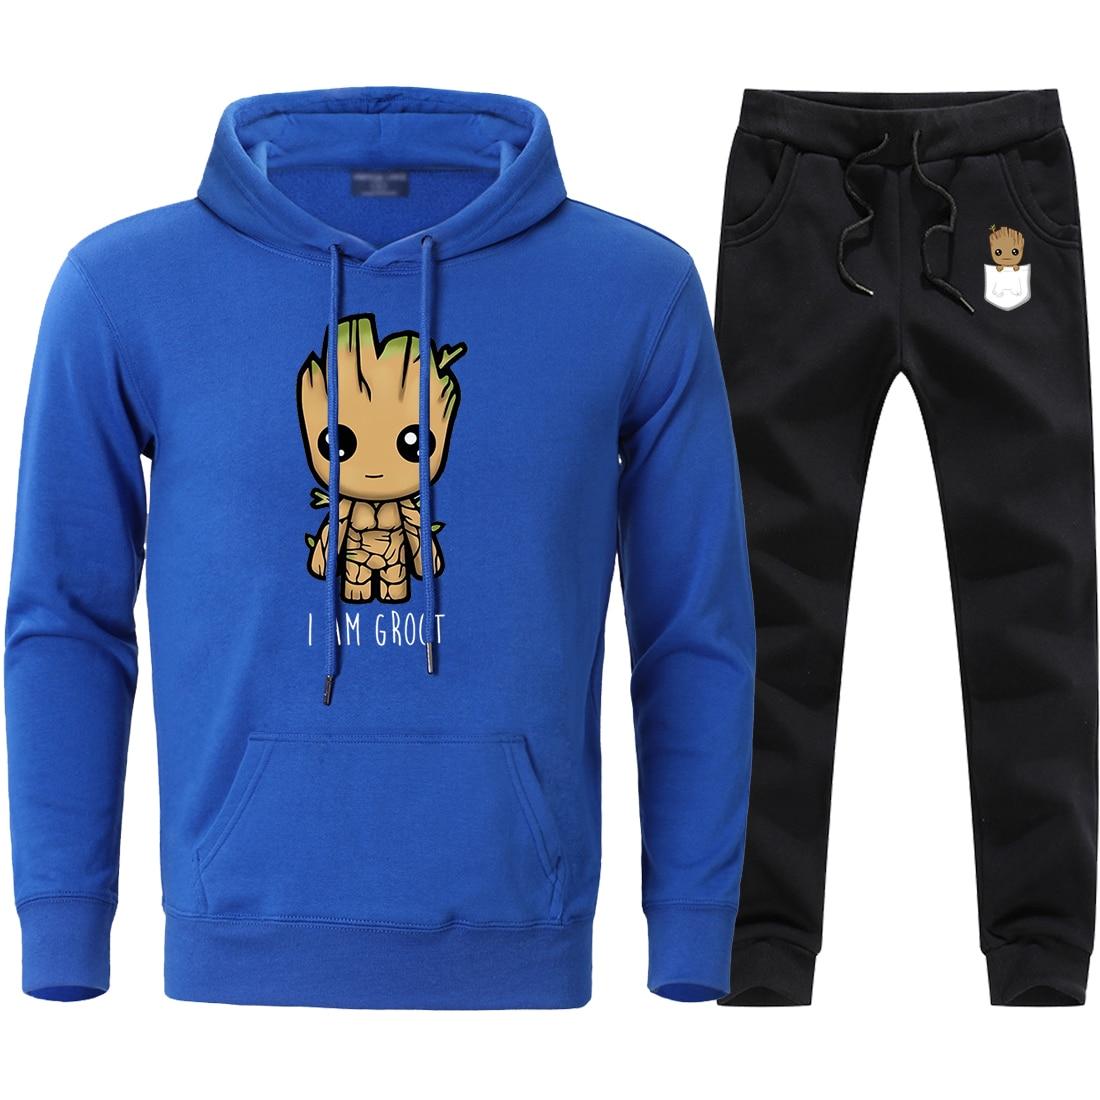 I Am Groot Print Mens Sets Autumn Winter Fleece Hoodies Sweatshirts + Sweatpants Sets 2020 Man Causal Tracksuits 2 Pieces Suits